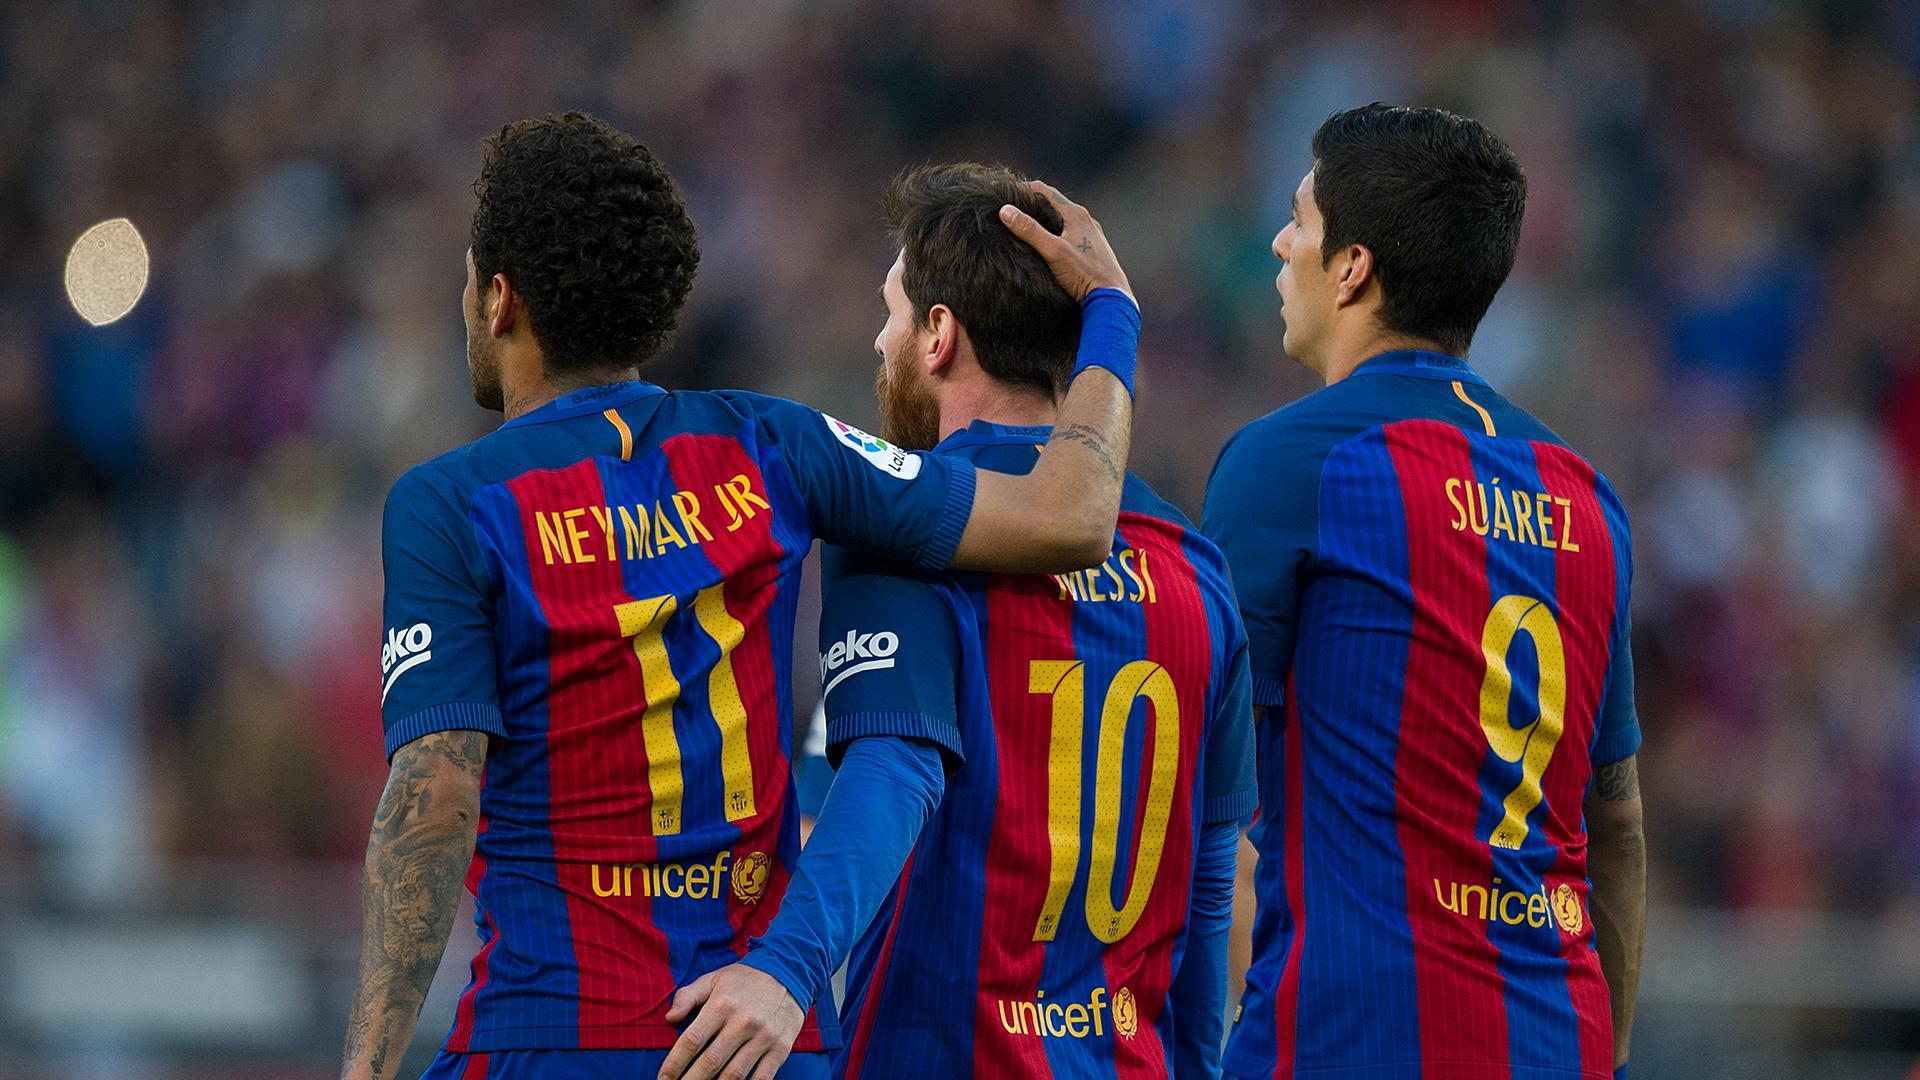 Mascherano hoping for Neymar return at Barcelona as he dreams of MSN reunion